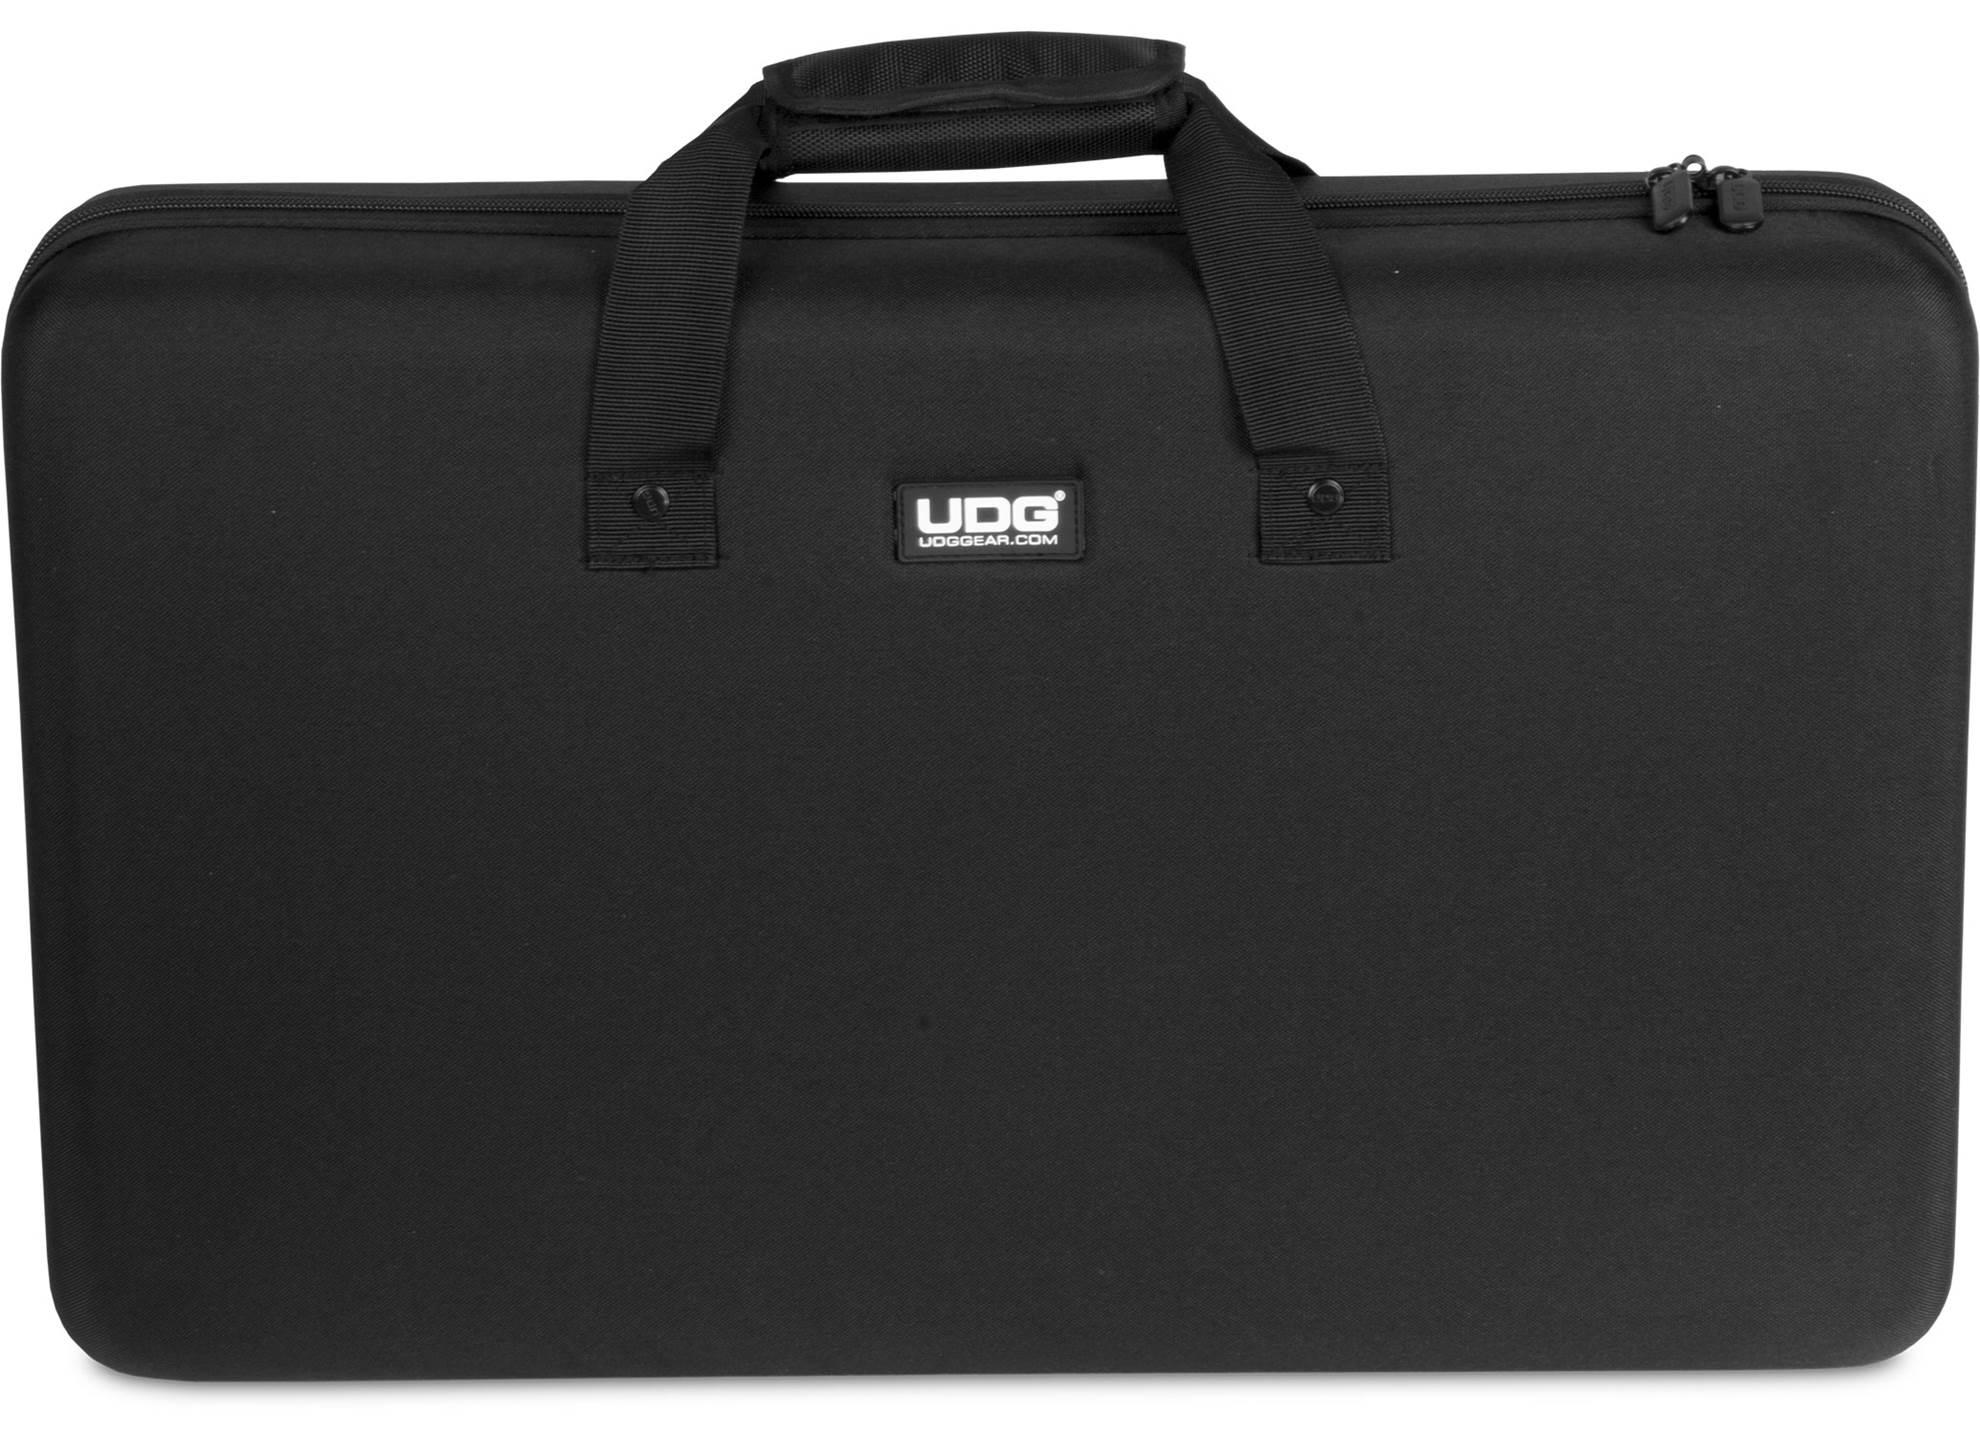 Creator Control Hardcase L MK2